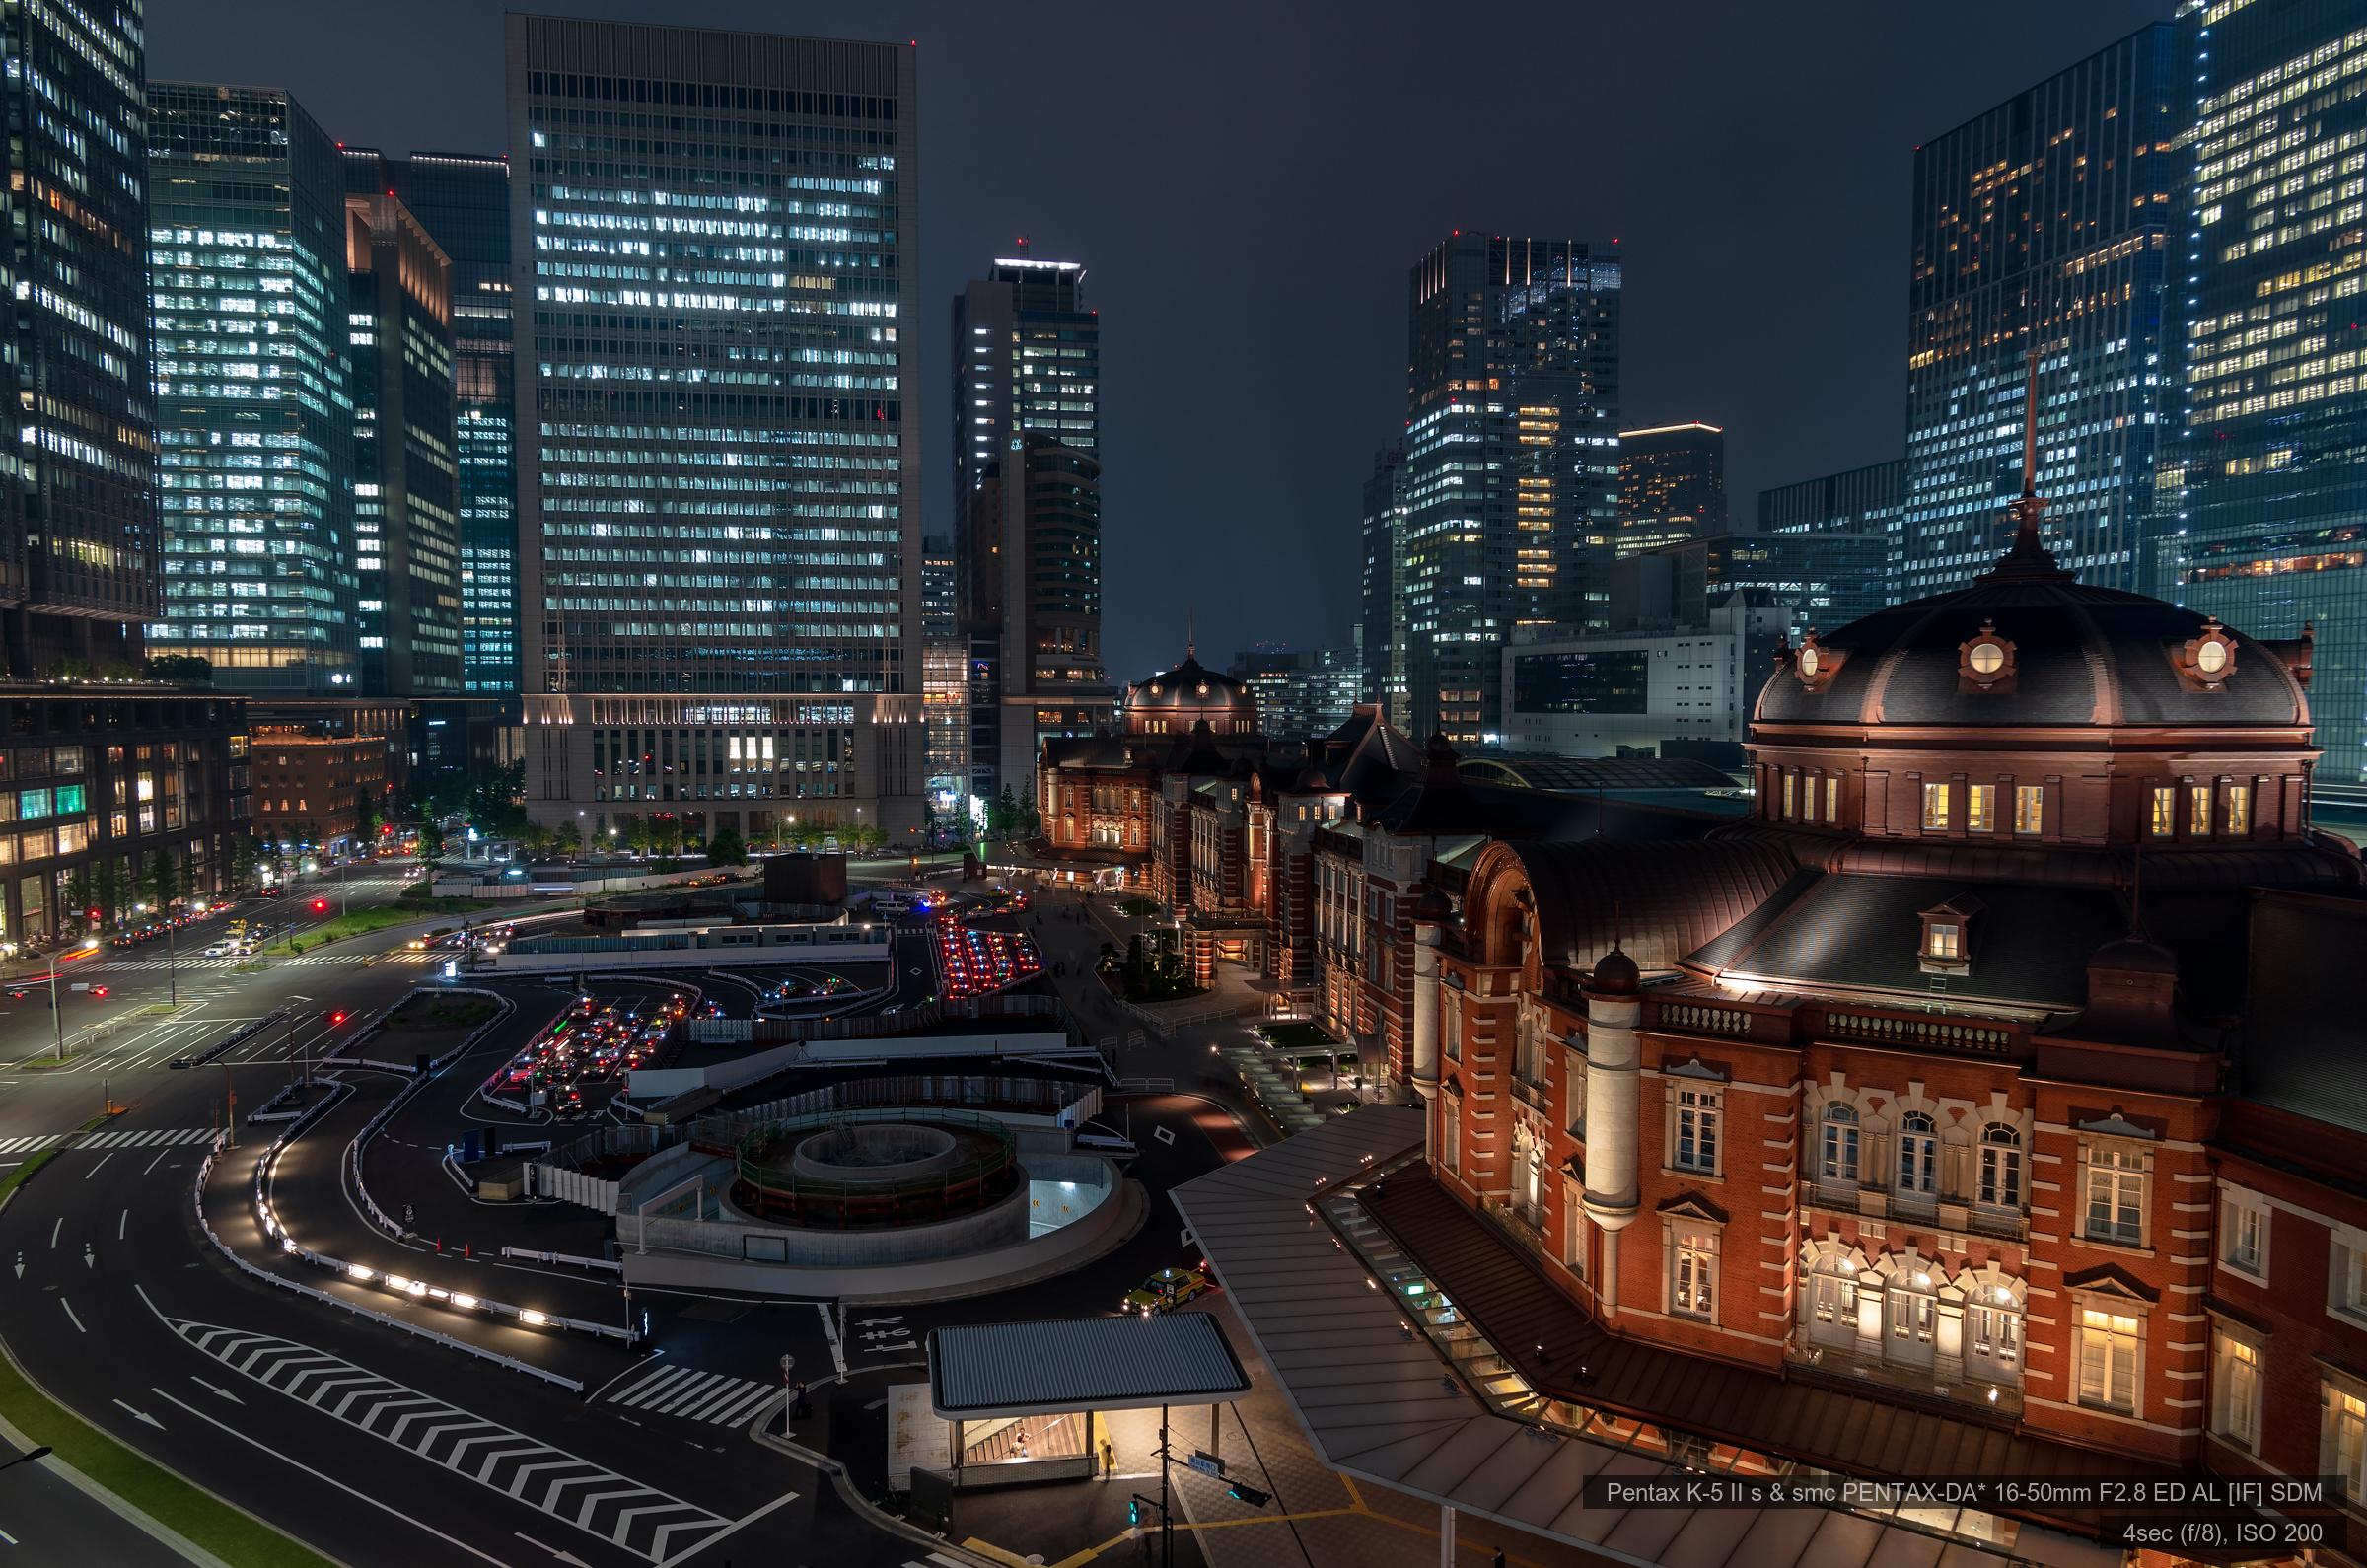 KITTE屋上庭園より東京駅 | PENTAX K-5IIs&DA★16-50mm